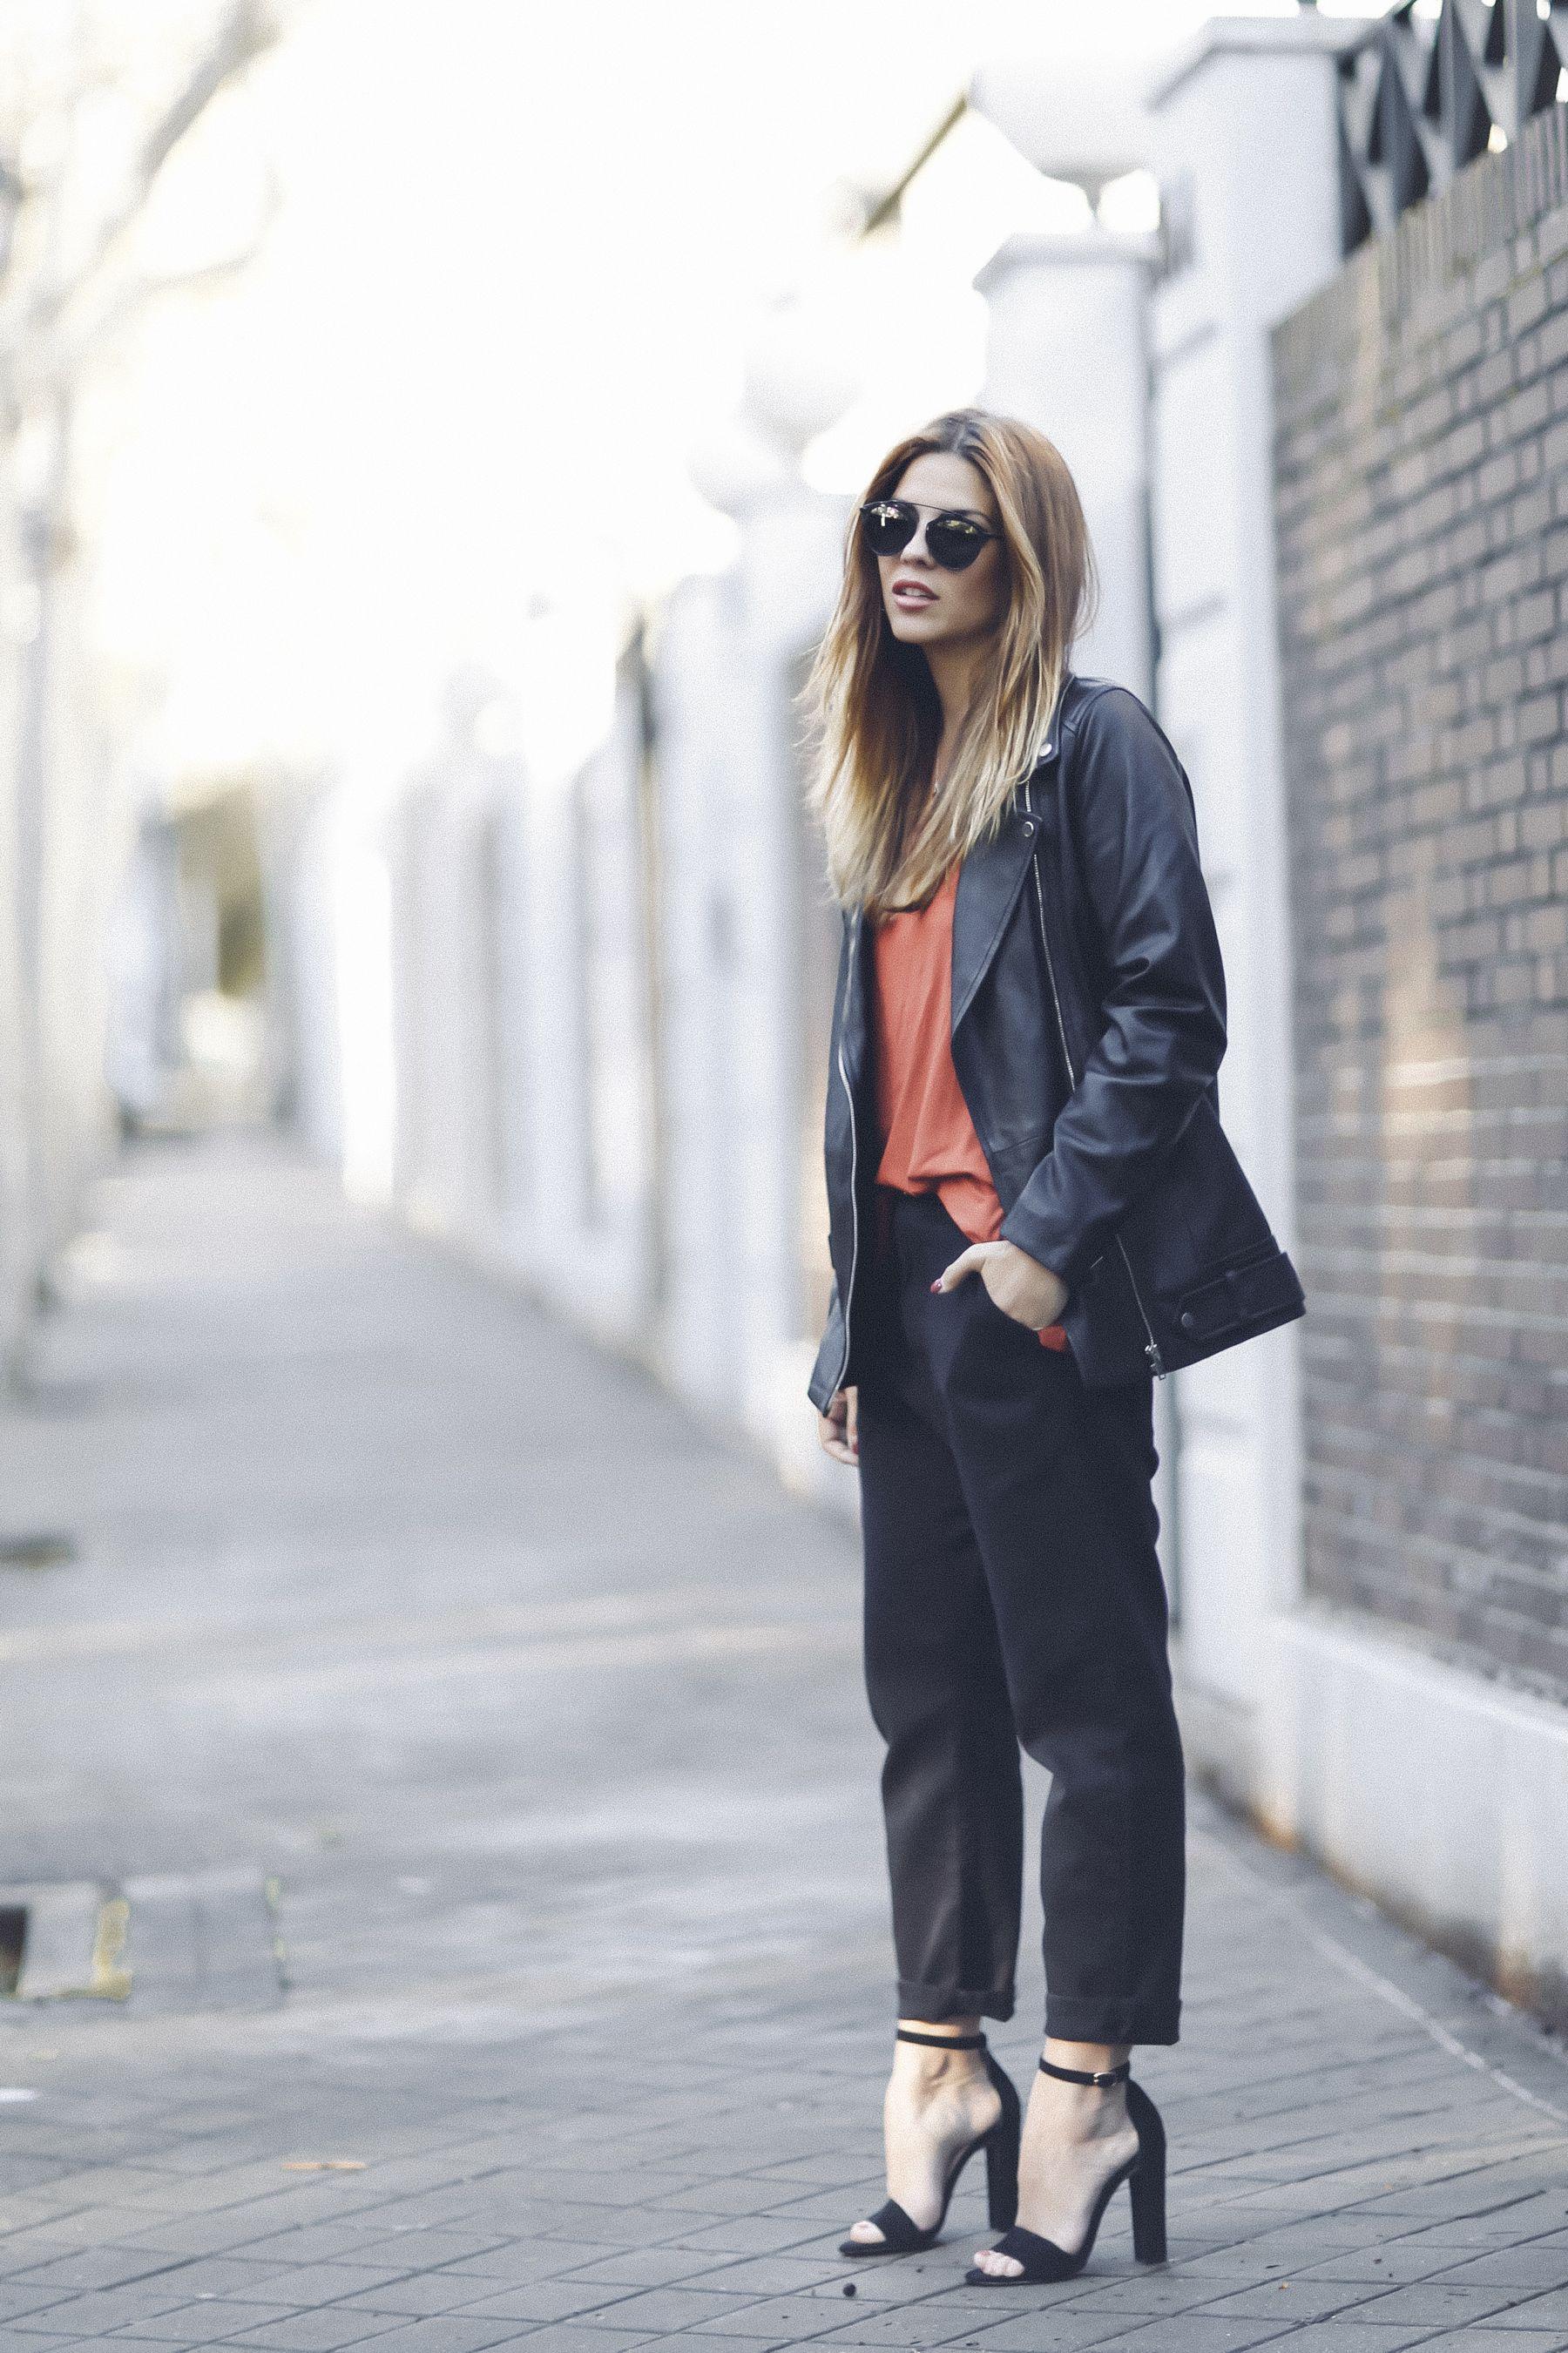 sandalias sandals mbym outfit look primavera spring camiseta zara steve madden Dior gafas de sol sunglasses street style trendy taste